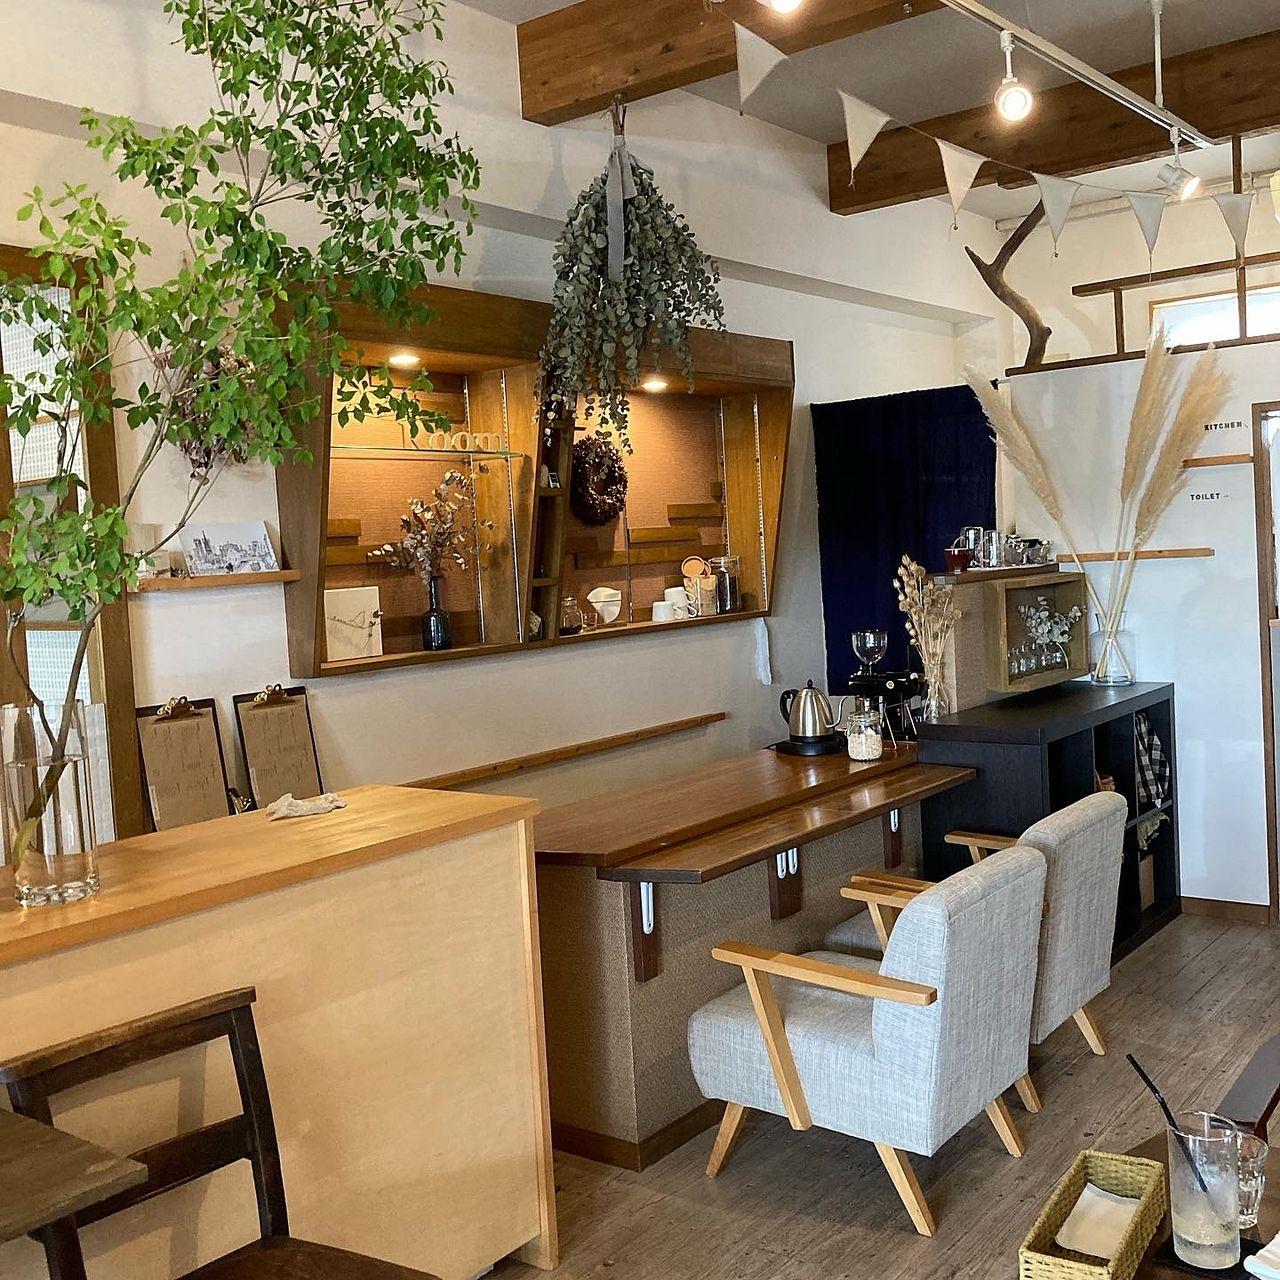 cafeRoom カフェルーム 松江市カフェ パンケーキ 松江市パンケーキ